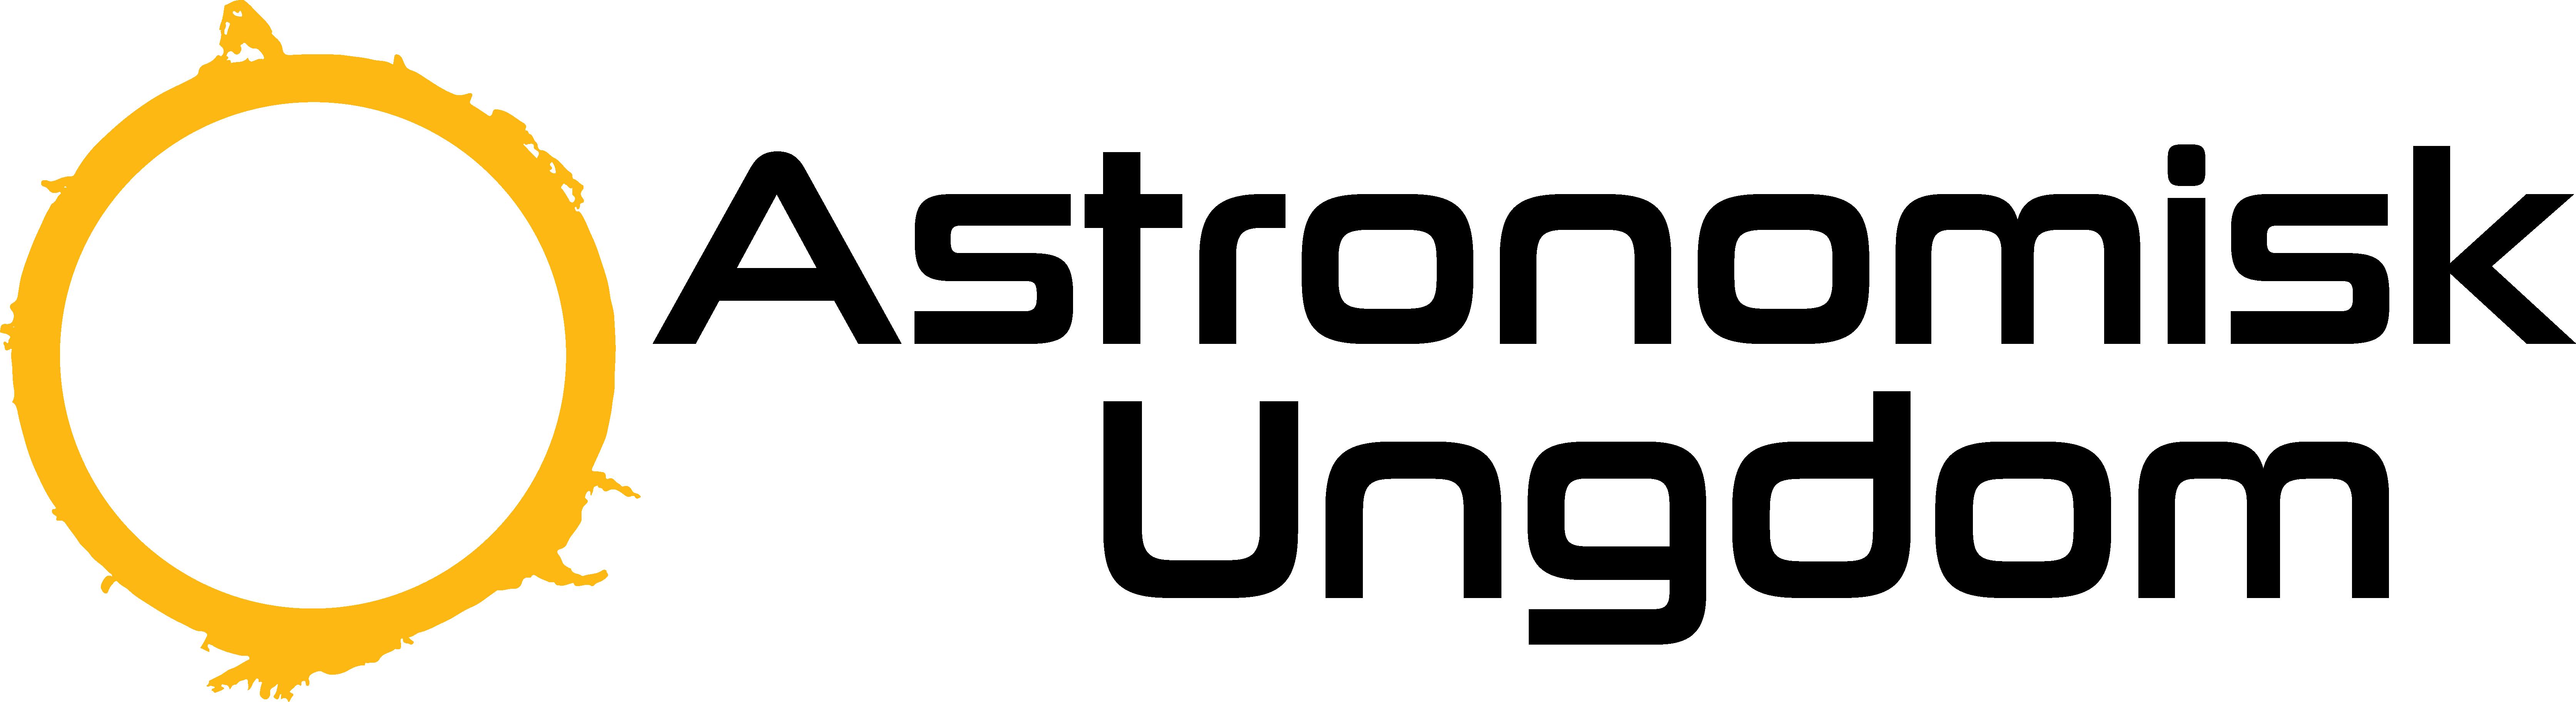 astronomisk-ungdom-logo